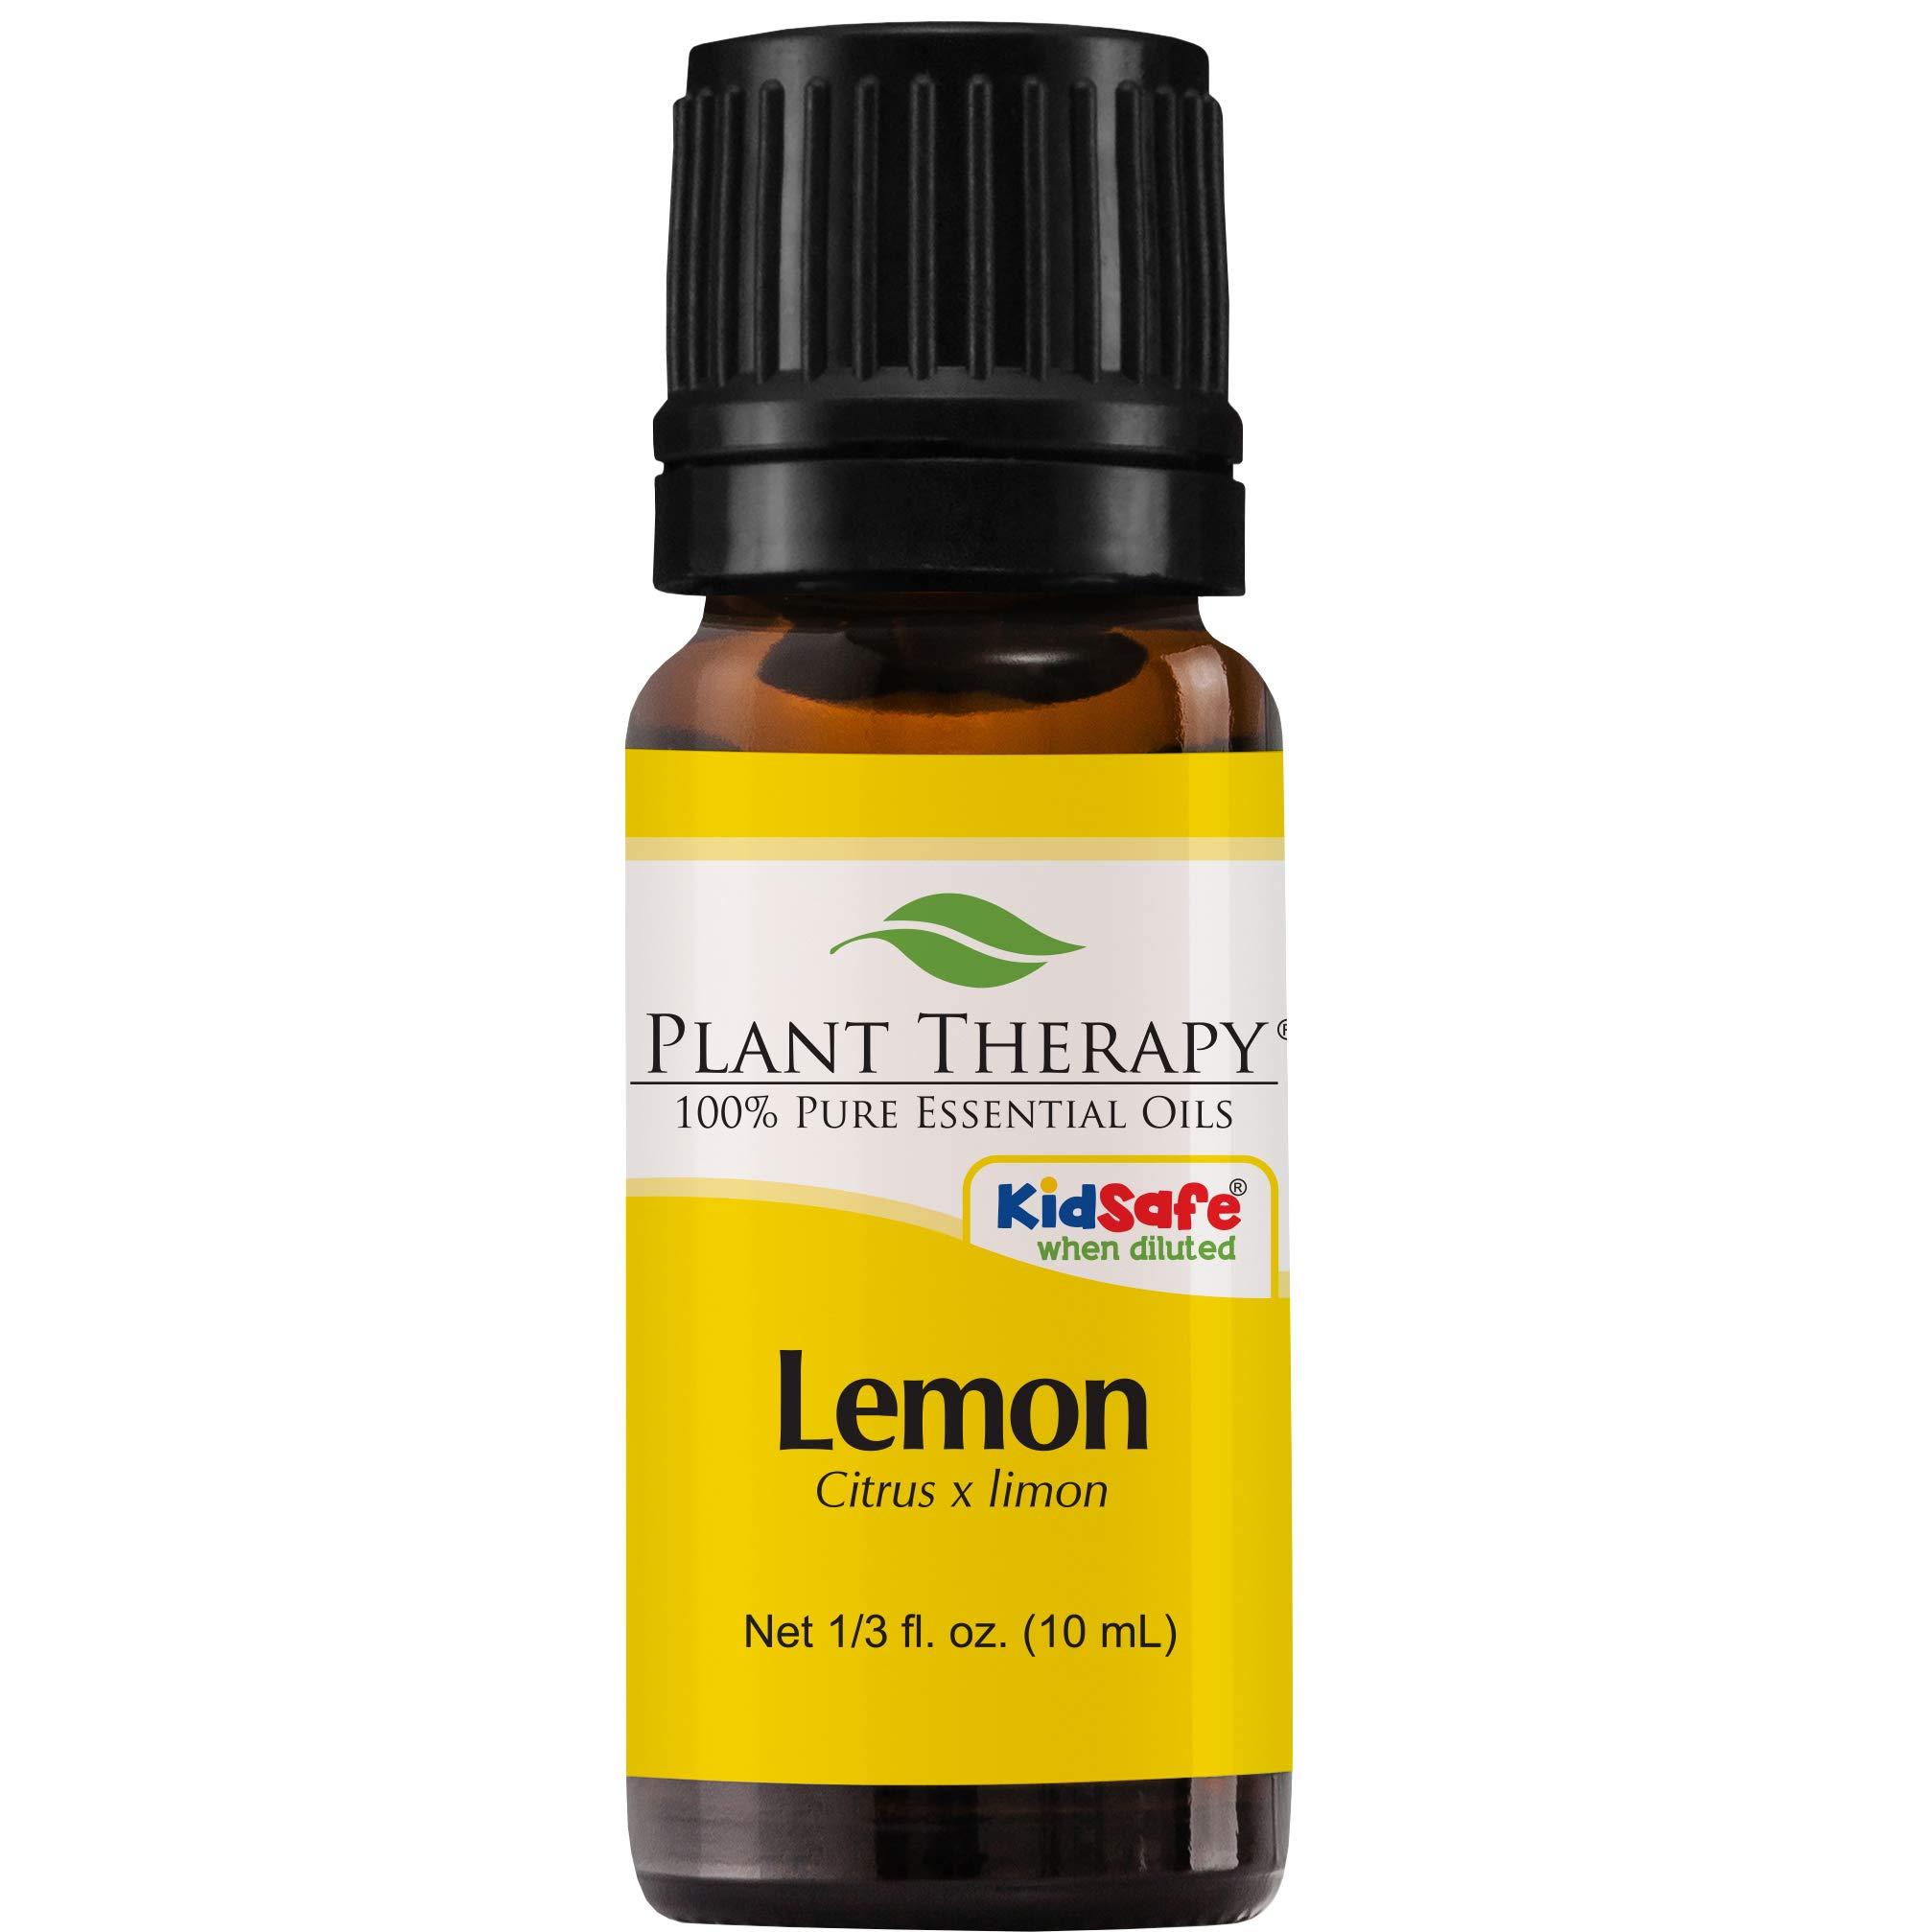 Plant Therapy Lemon Essential Oil 10 mL (1/3 oz) 100% Pure, Undiluted, Therapeutic Grade